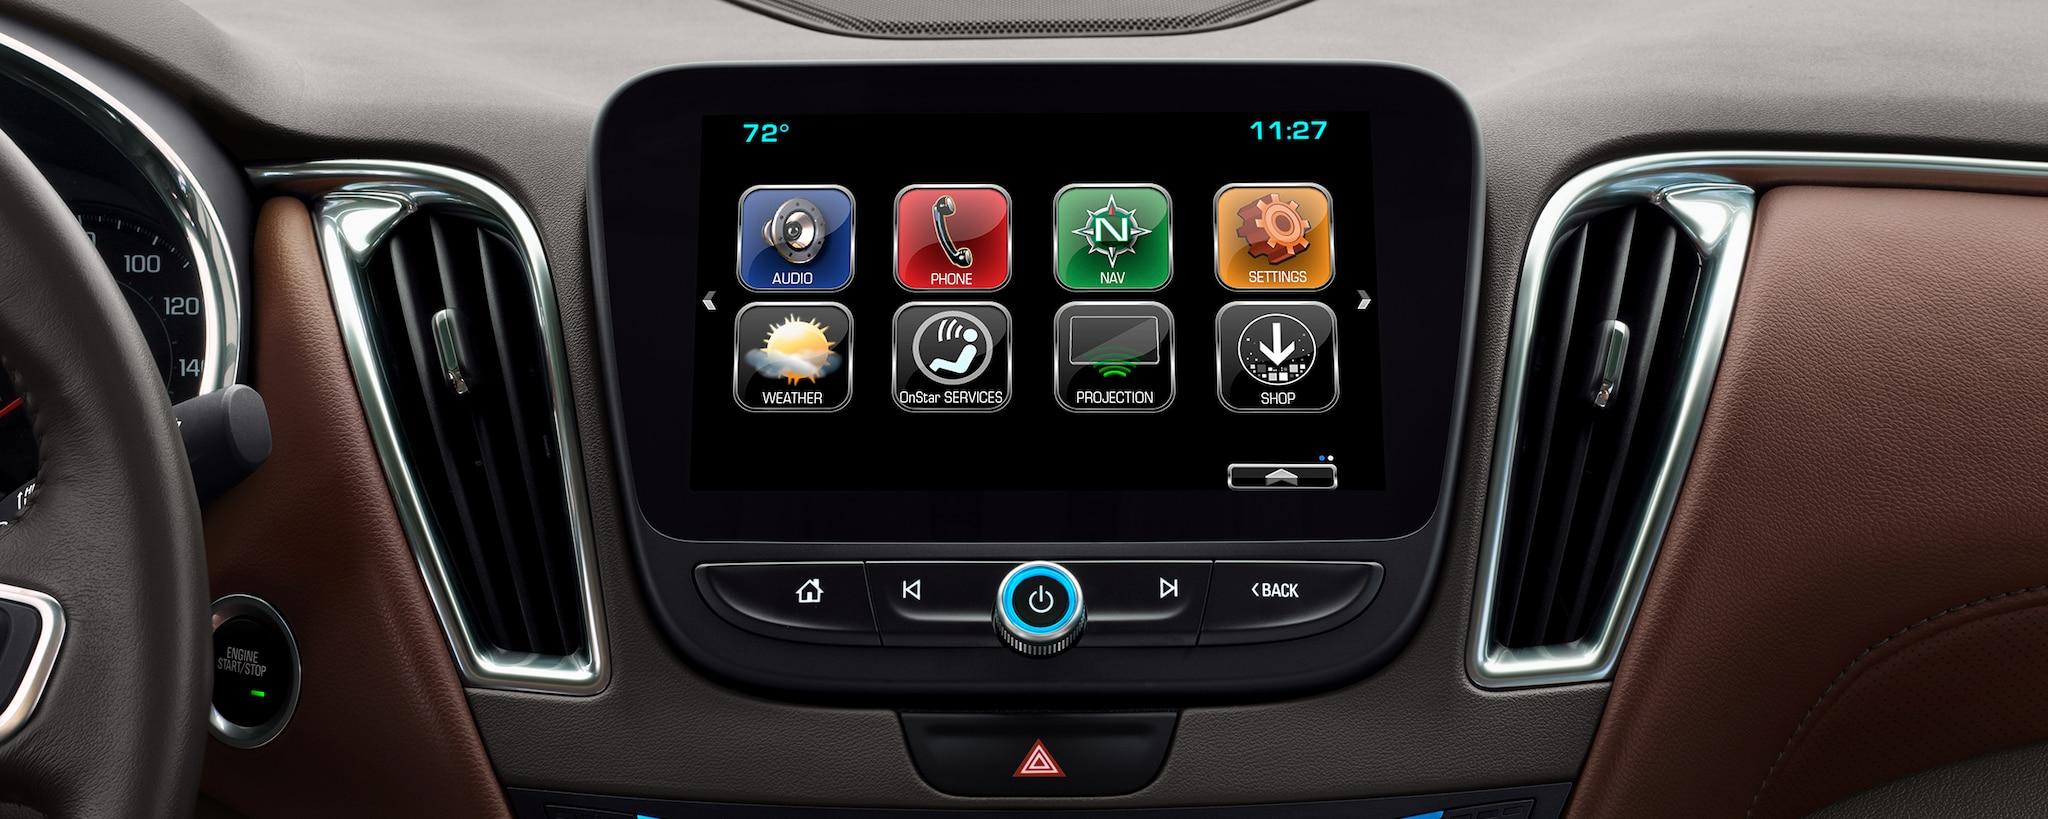 Gama de autos Chevrolet: MyLink